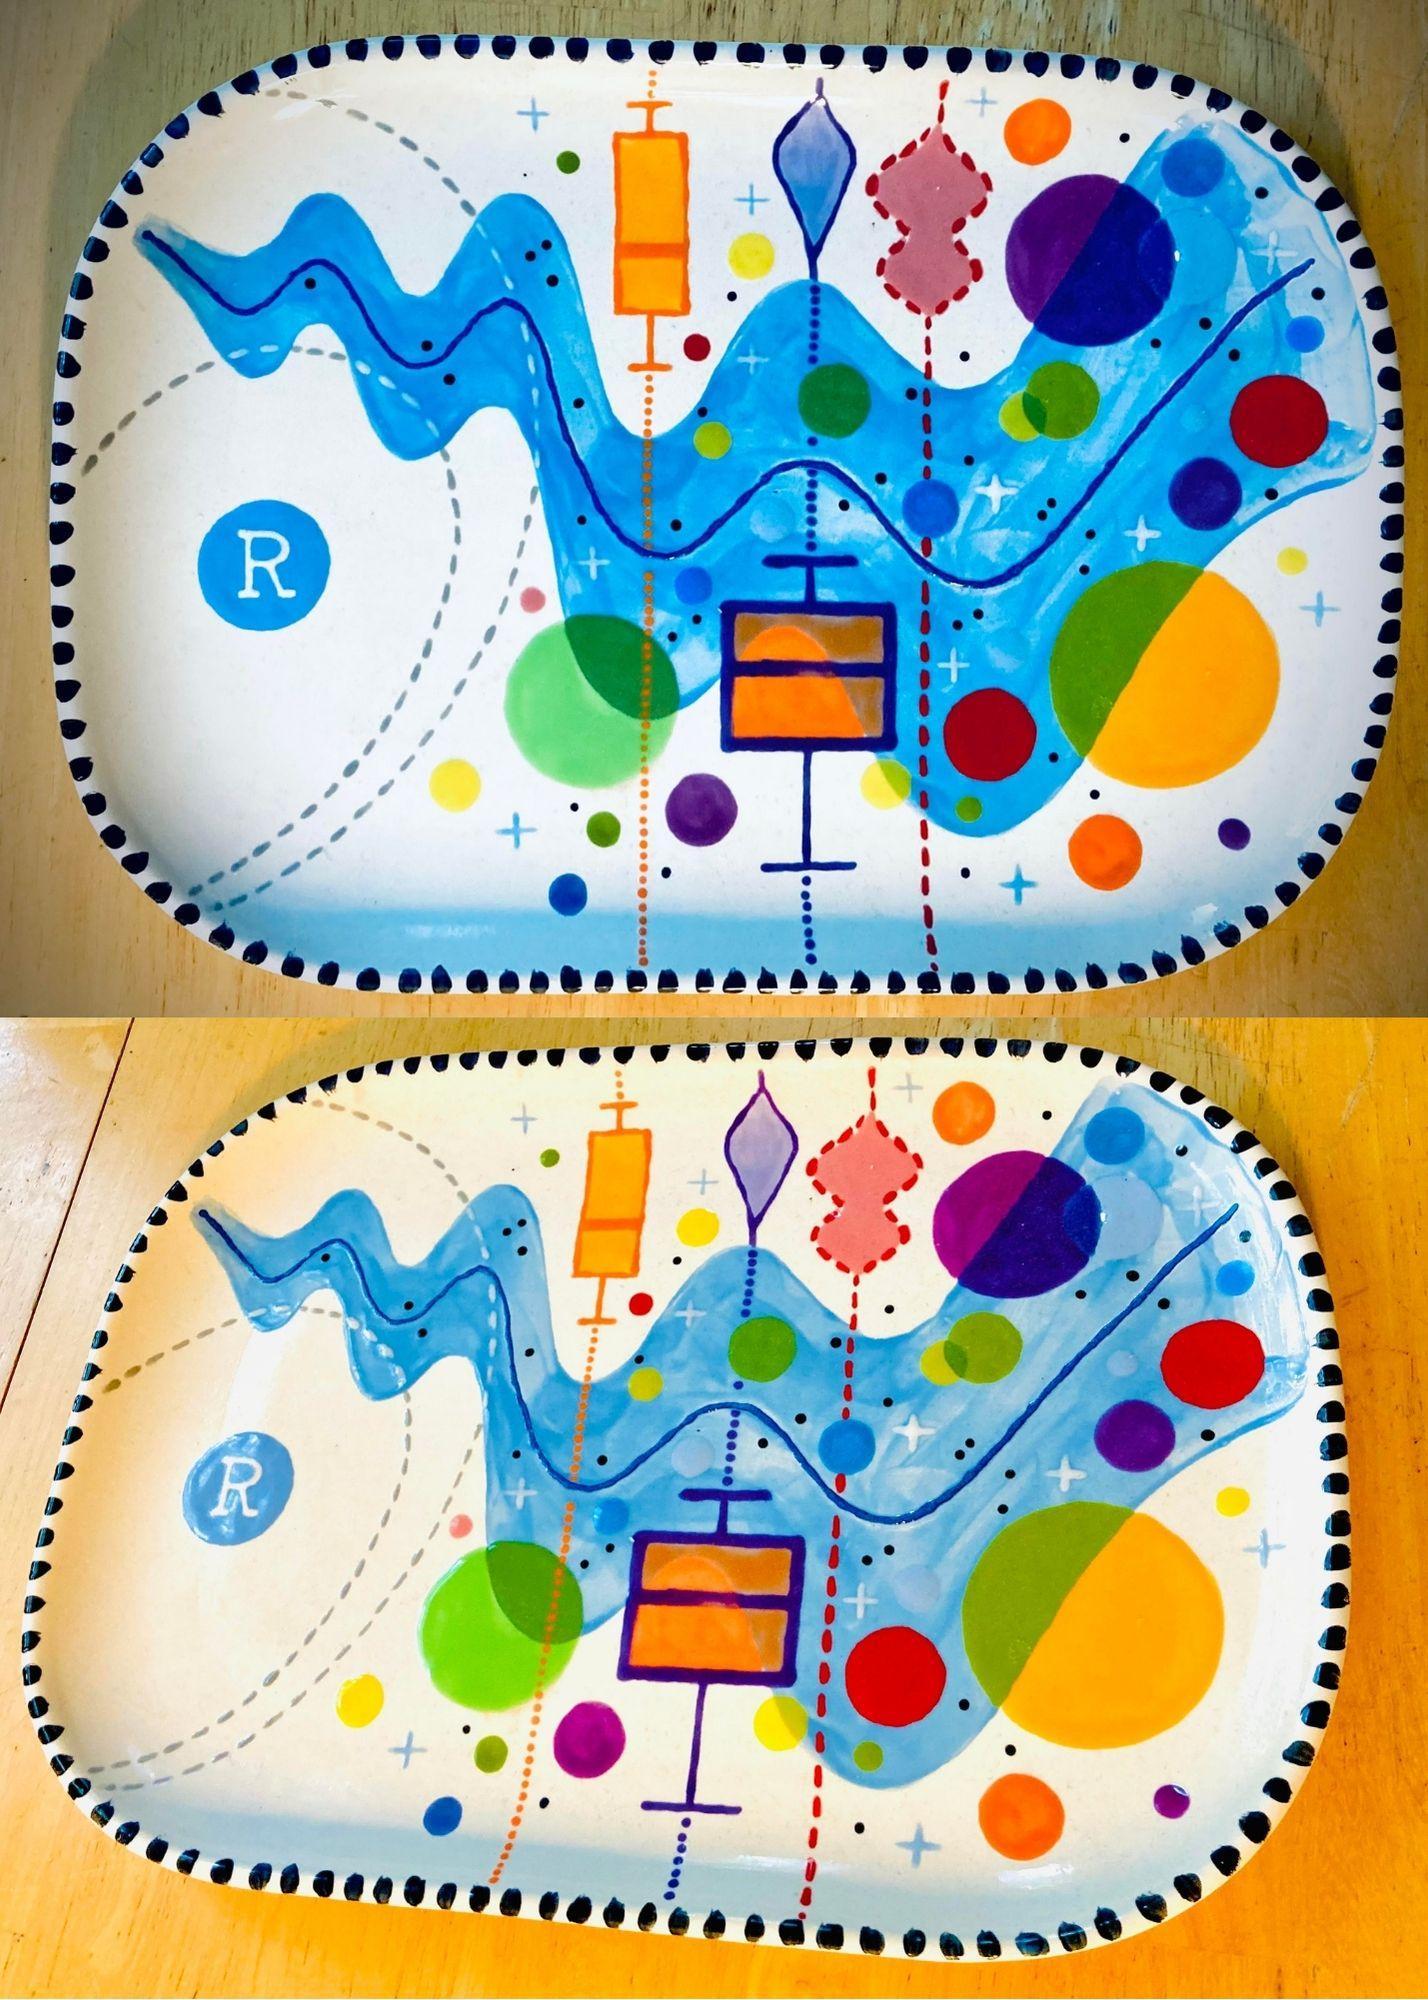 ggplot plate by Selina Carter